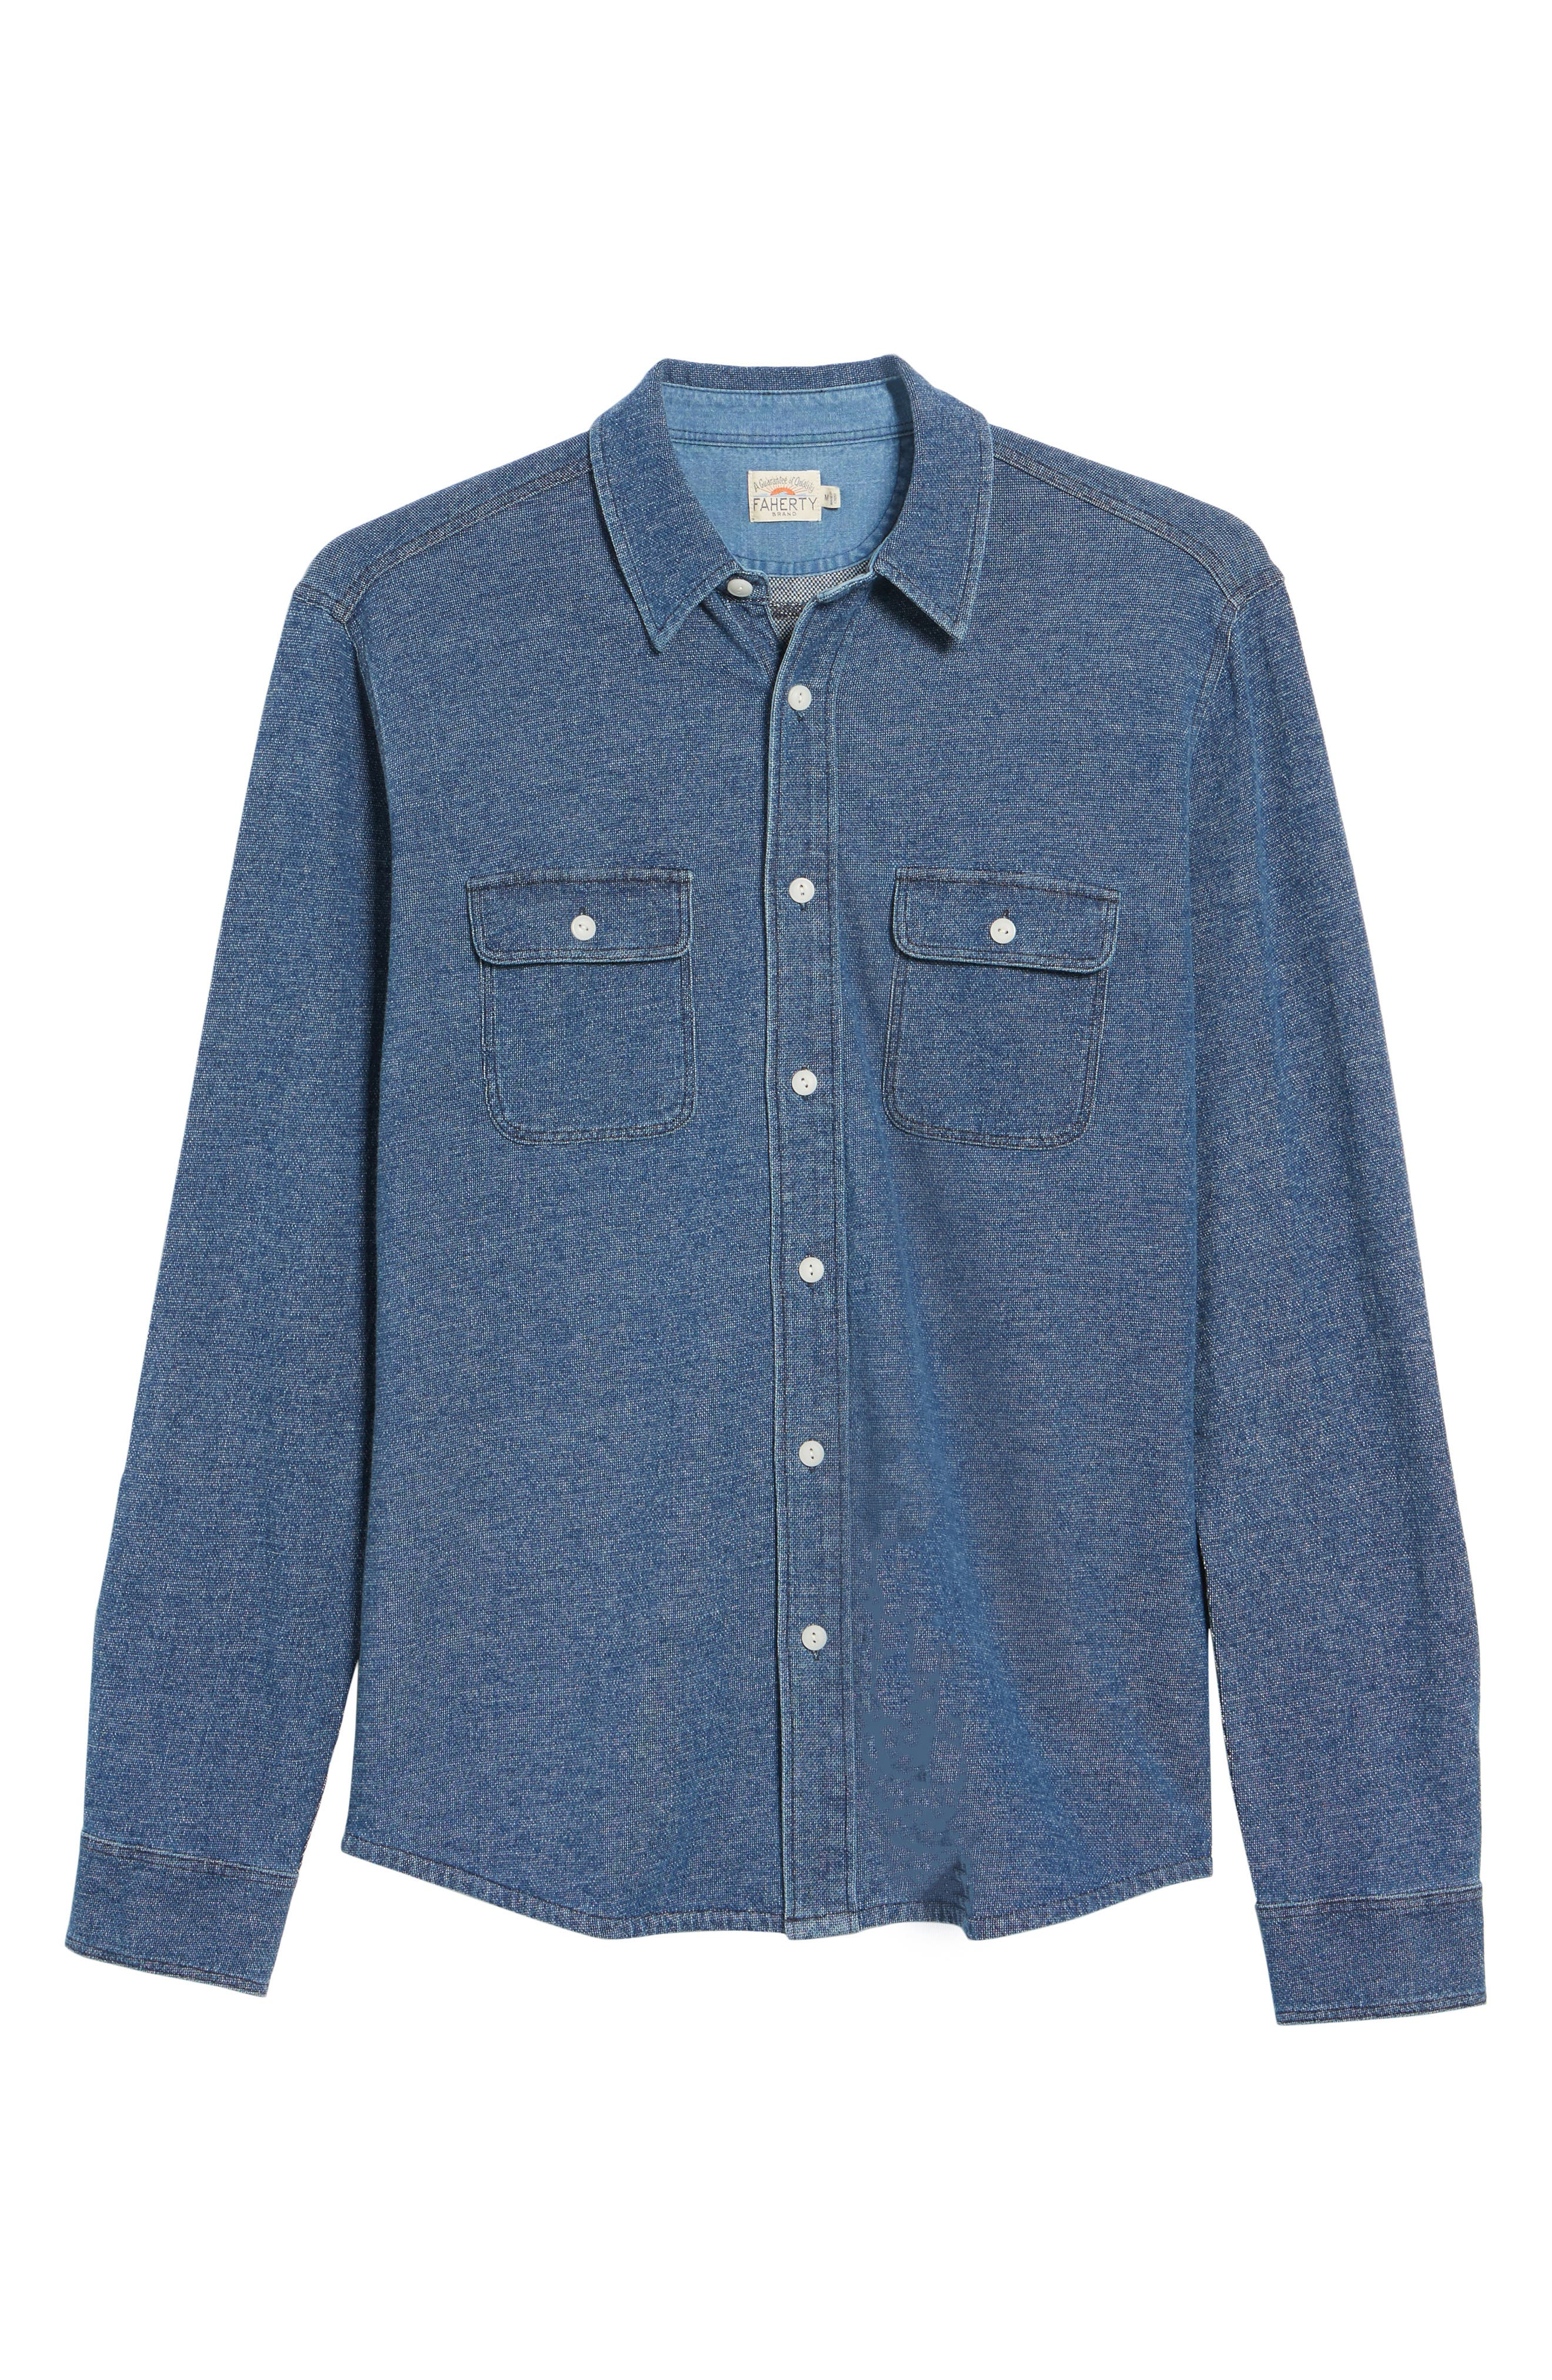 Belmar Chambray Knit Sport Shirt,                             Alternate thumbnail 6, color,